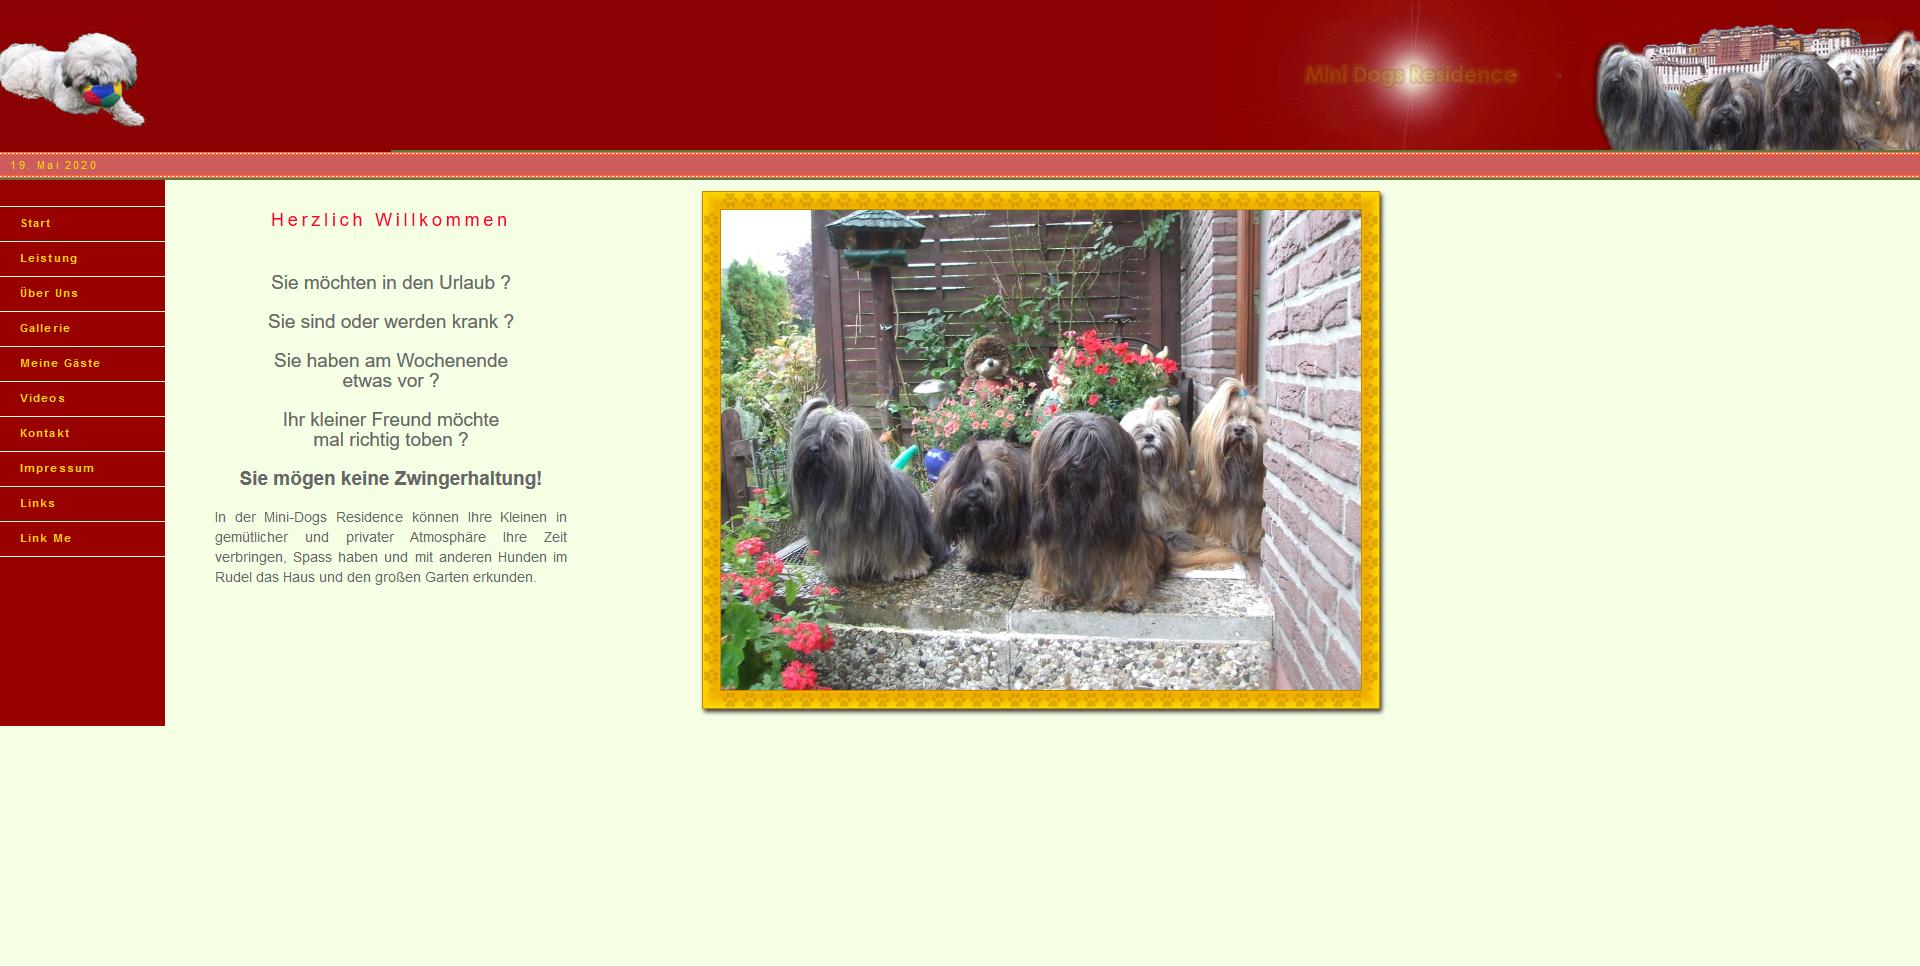 Mini-Dogs Residence